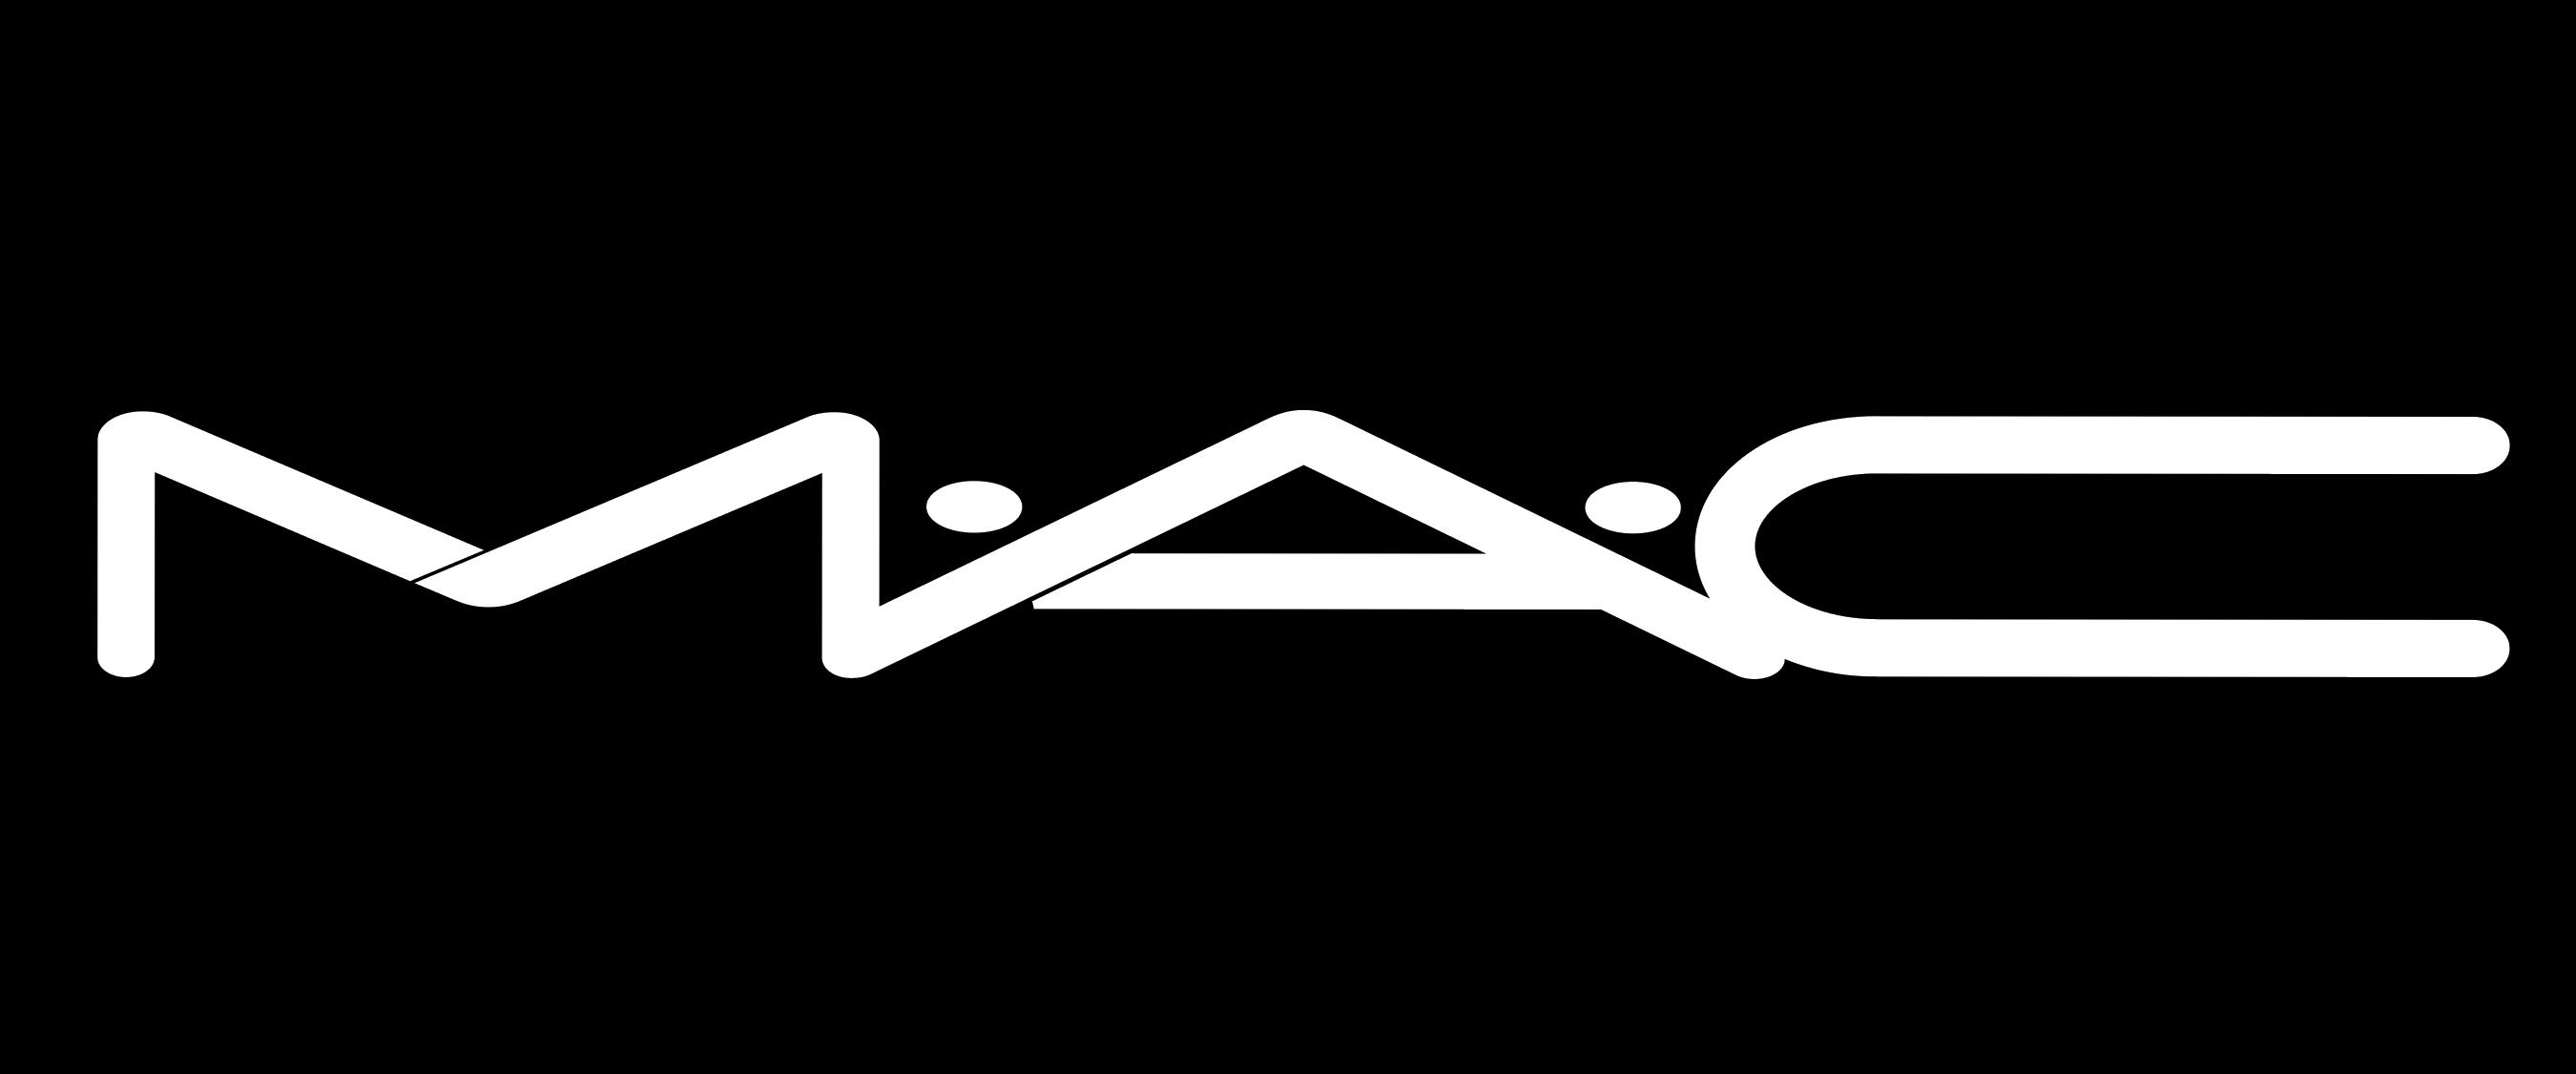 Mac Cosmetics - Foyleside